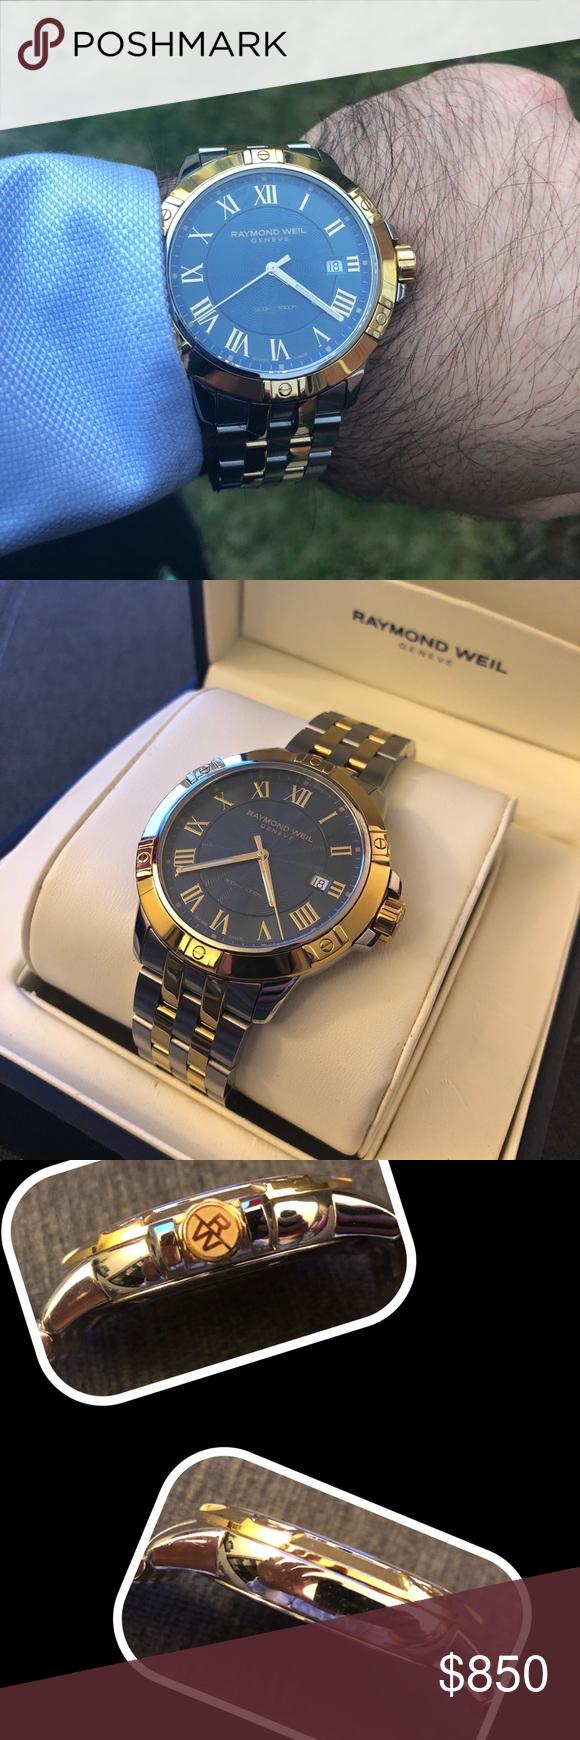 75e96c4b11 Raymond Weil 8160-STP-00508 Mens Wrist Watch. -This tango classic men s